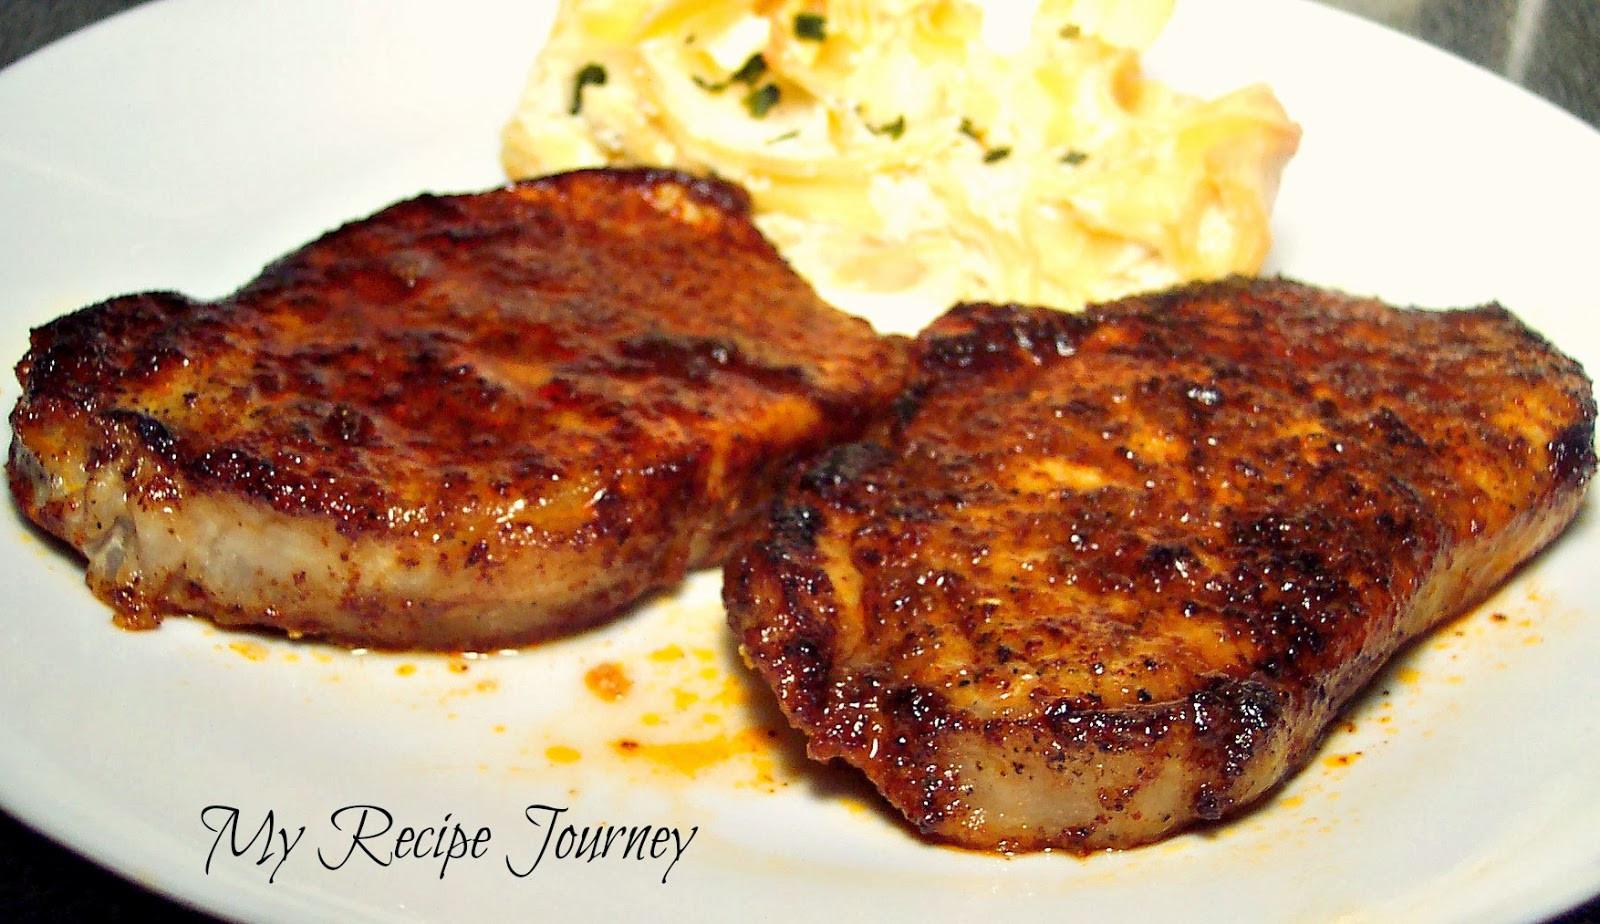 Mexican Pork Recipes  My Recipe Journey Mexican Pork Chops